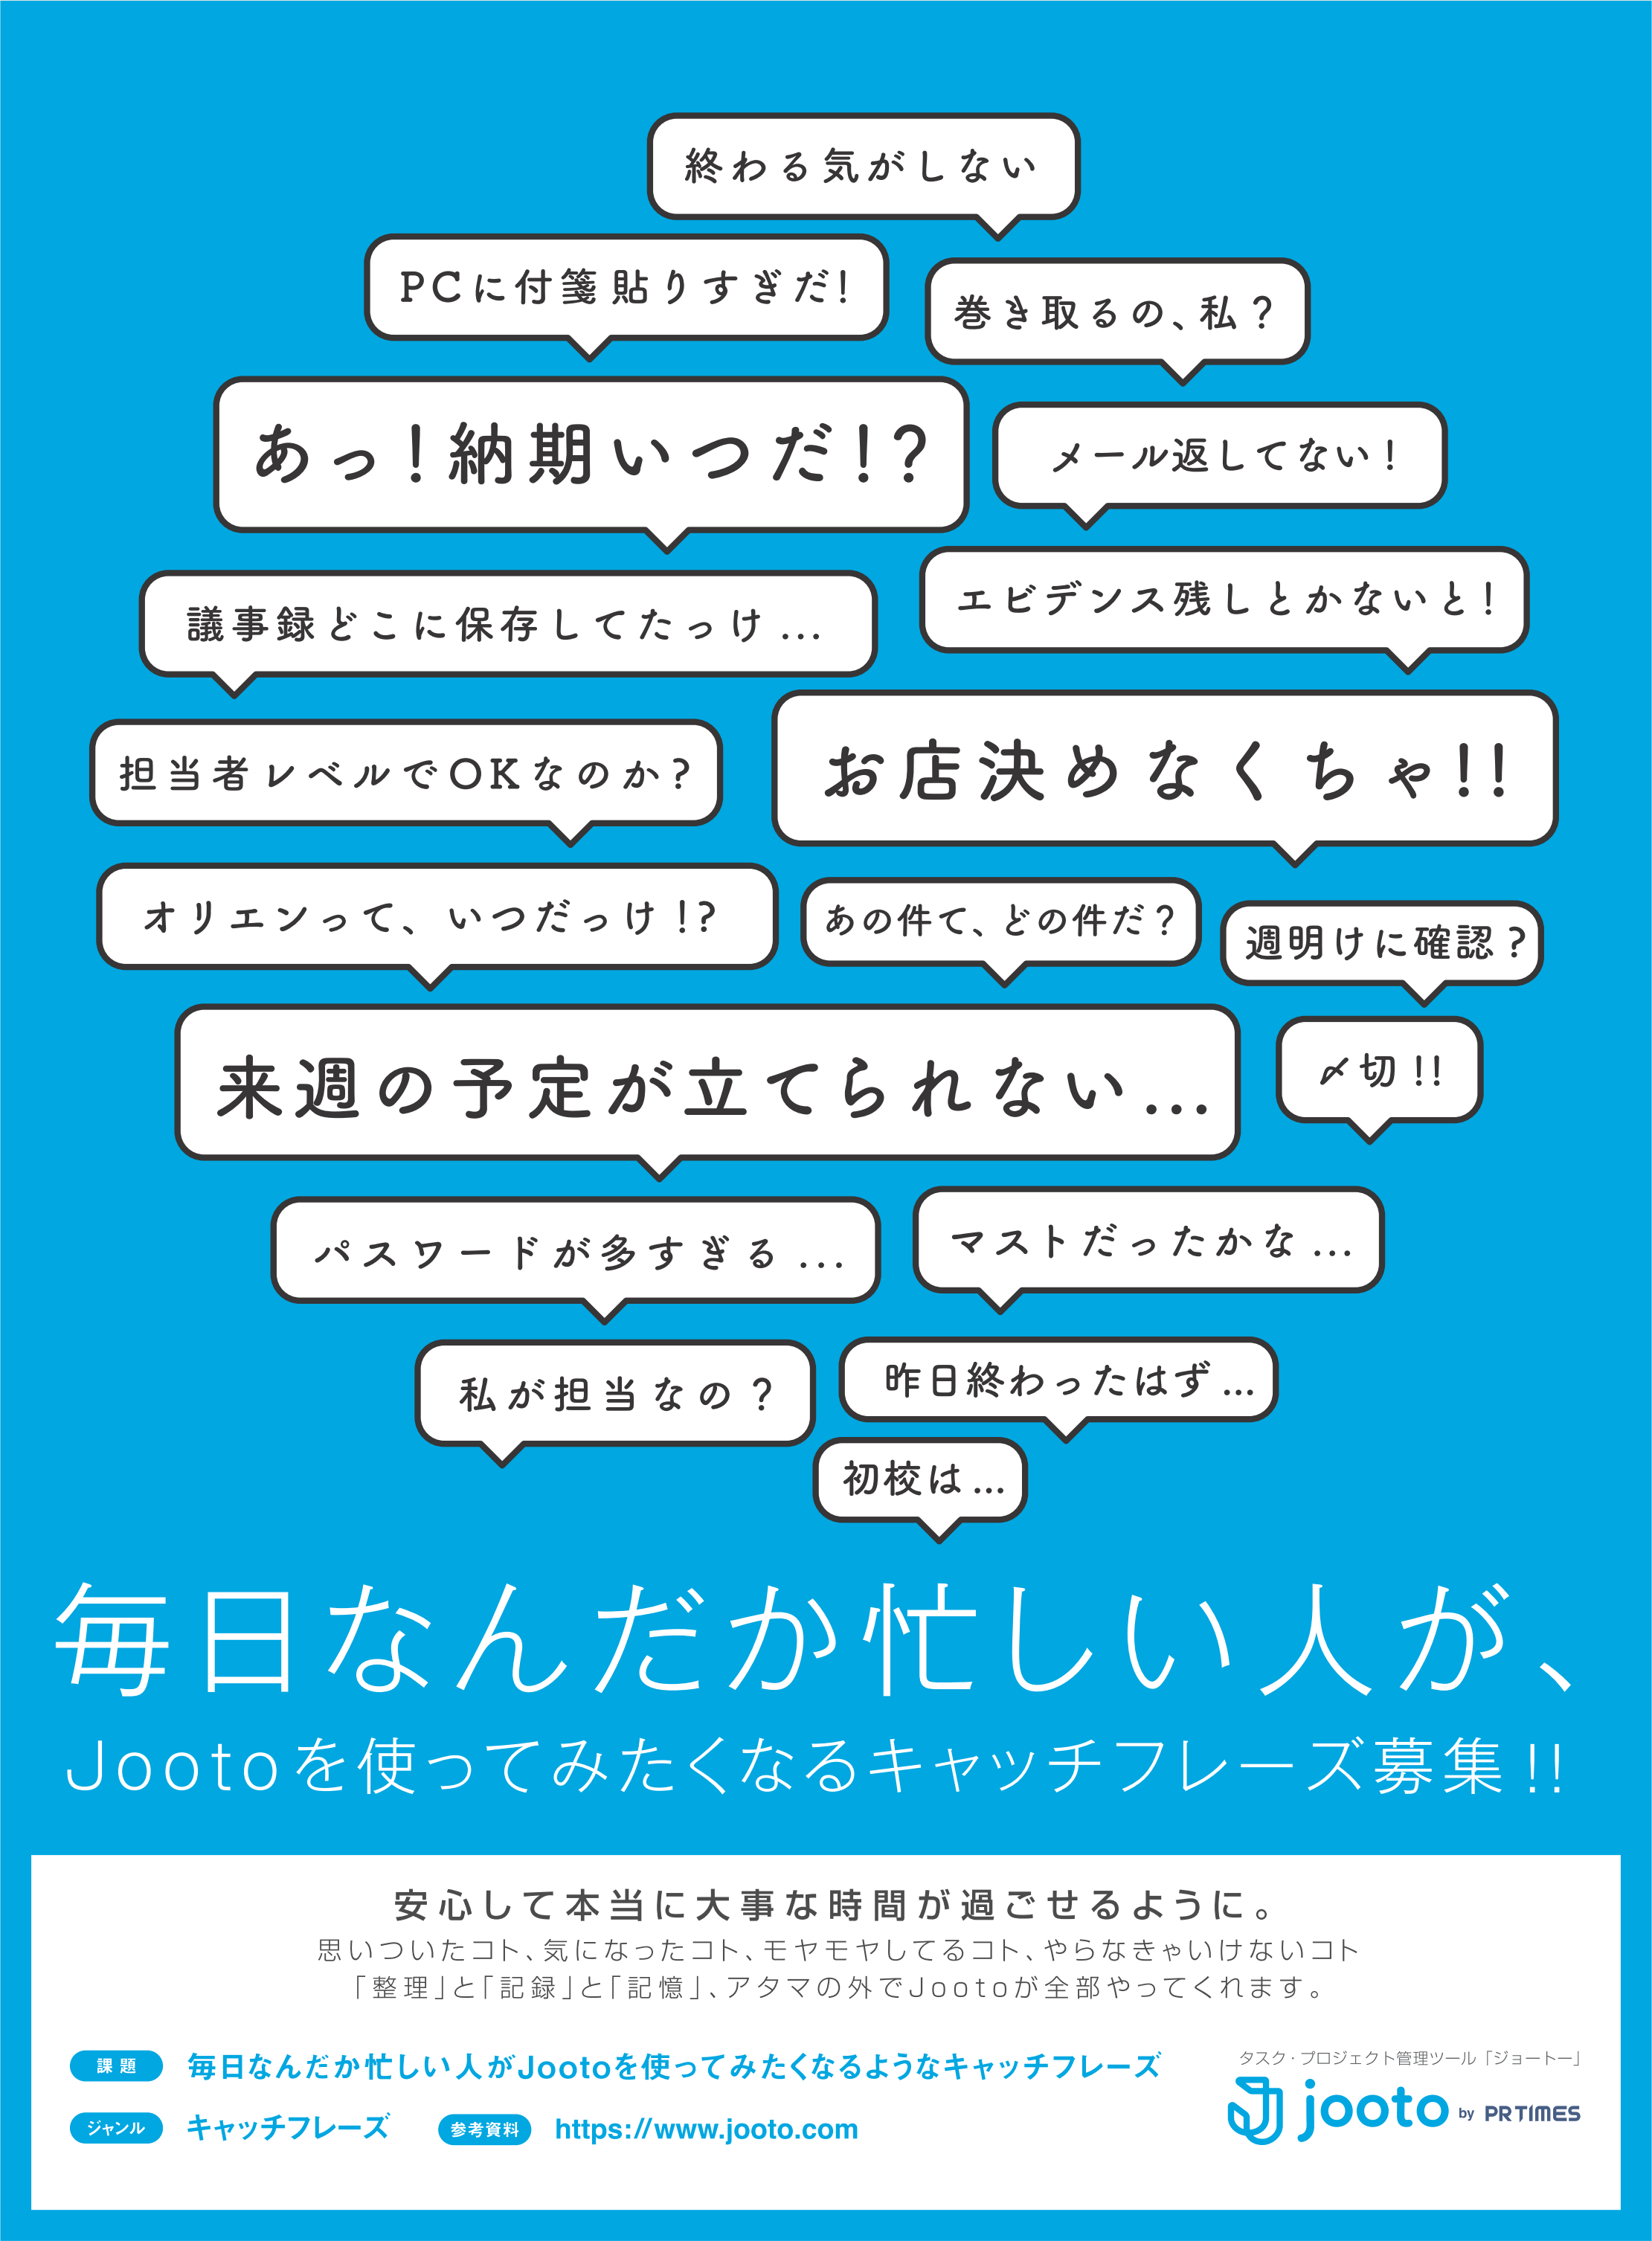 44.PR TIMES(Jooto)